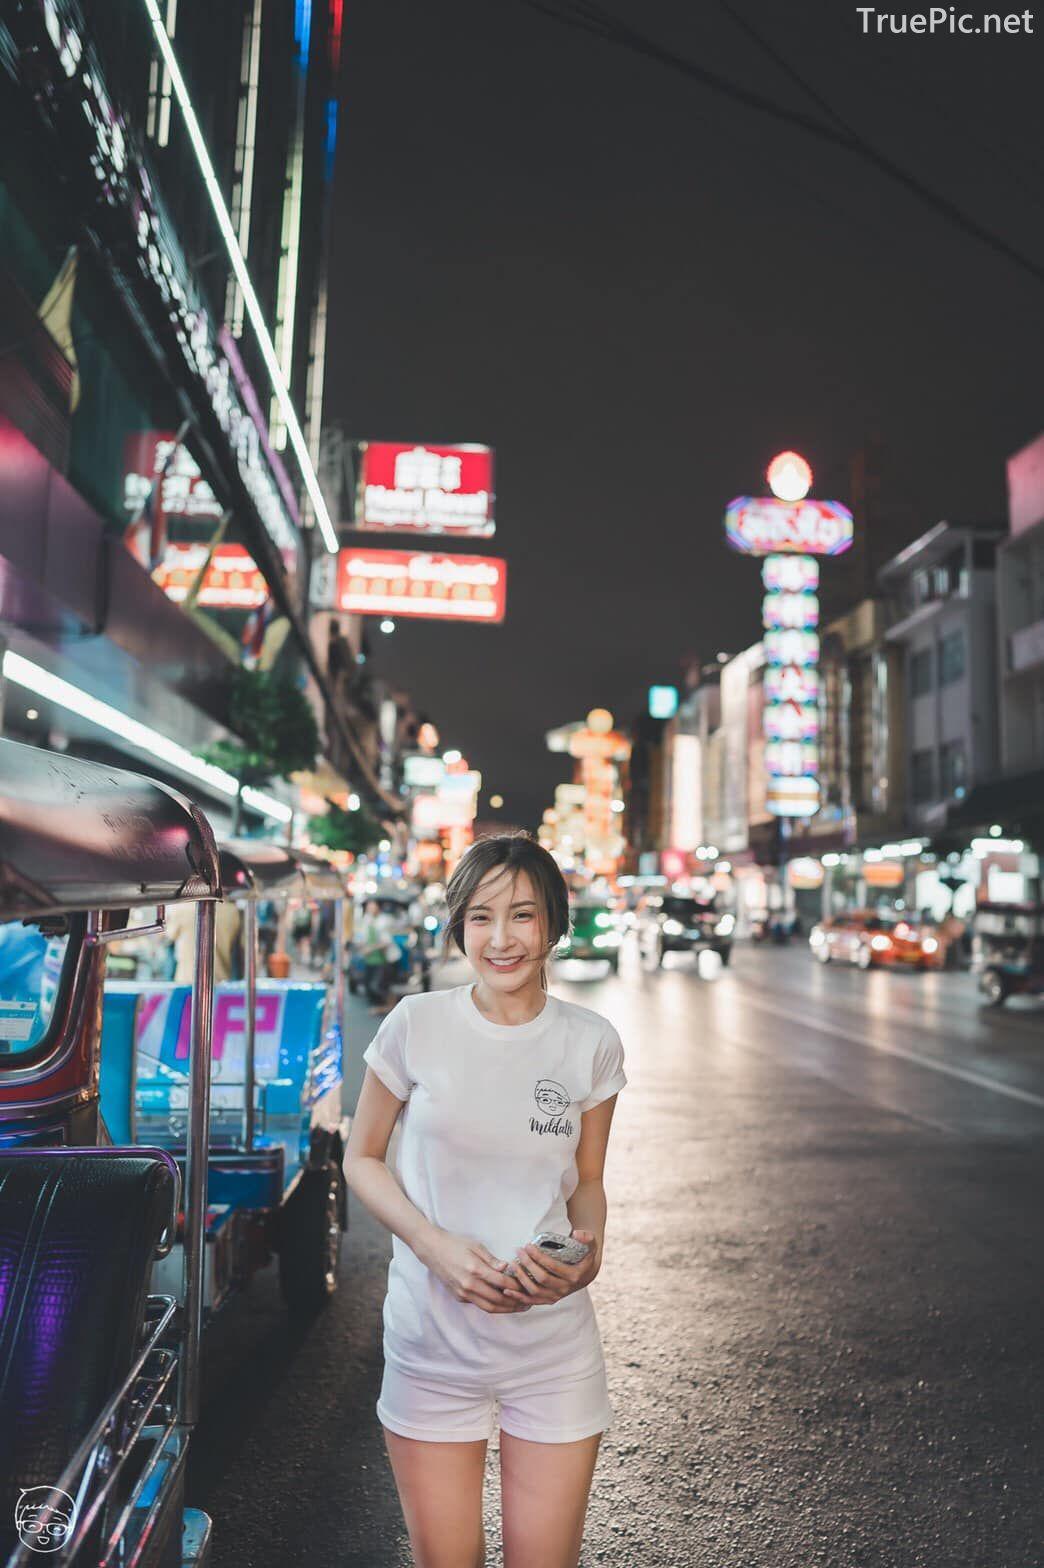 Thailand Hot Girl - Thanyarat Charoenpornkittada - Bustling City Tours - TruePic.net - Picture 8